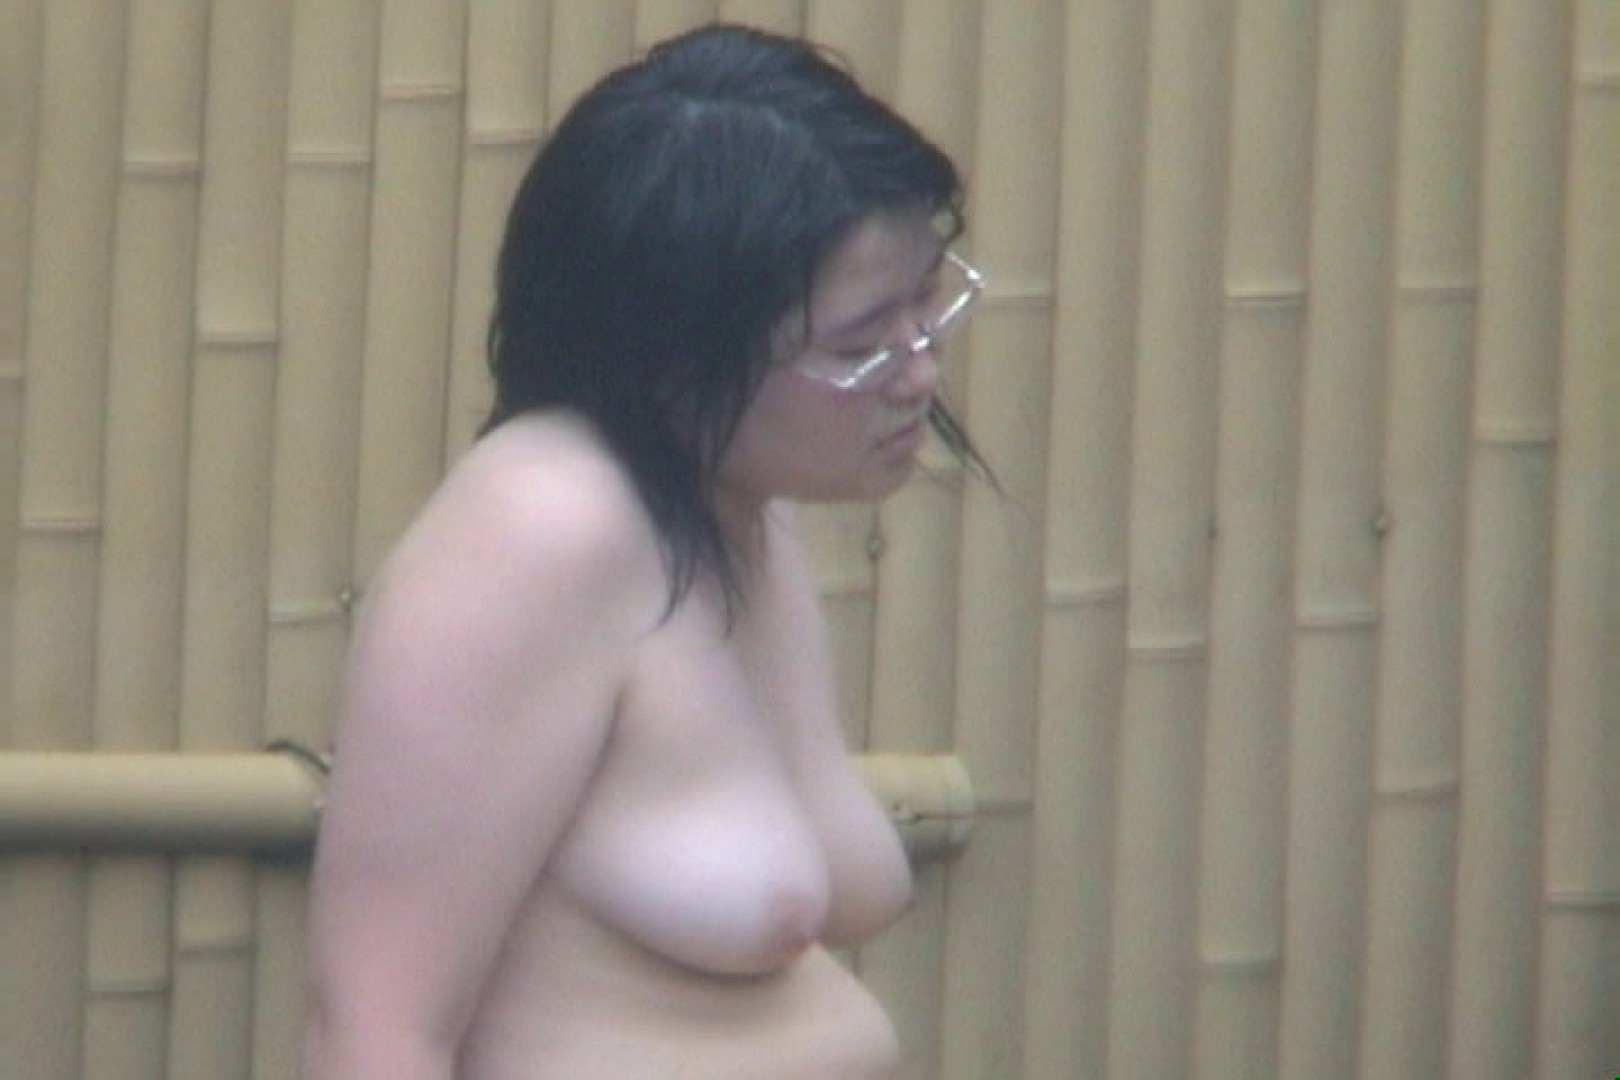 Aquaな露天風呂Vol.46【VIP限定】 OL女体 アダルト動画キャプチャ 98連発 98